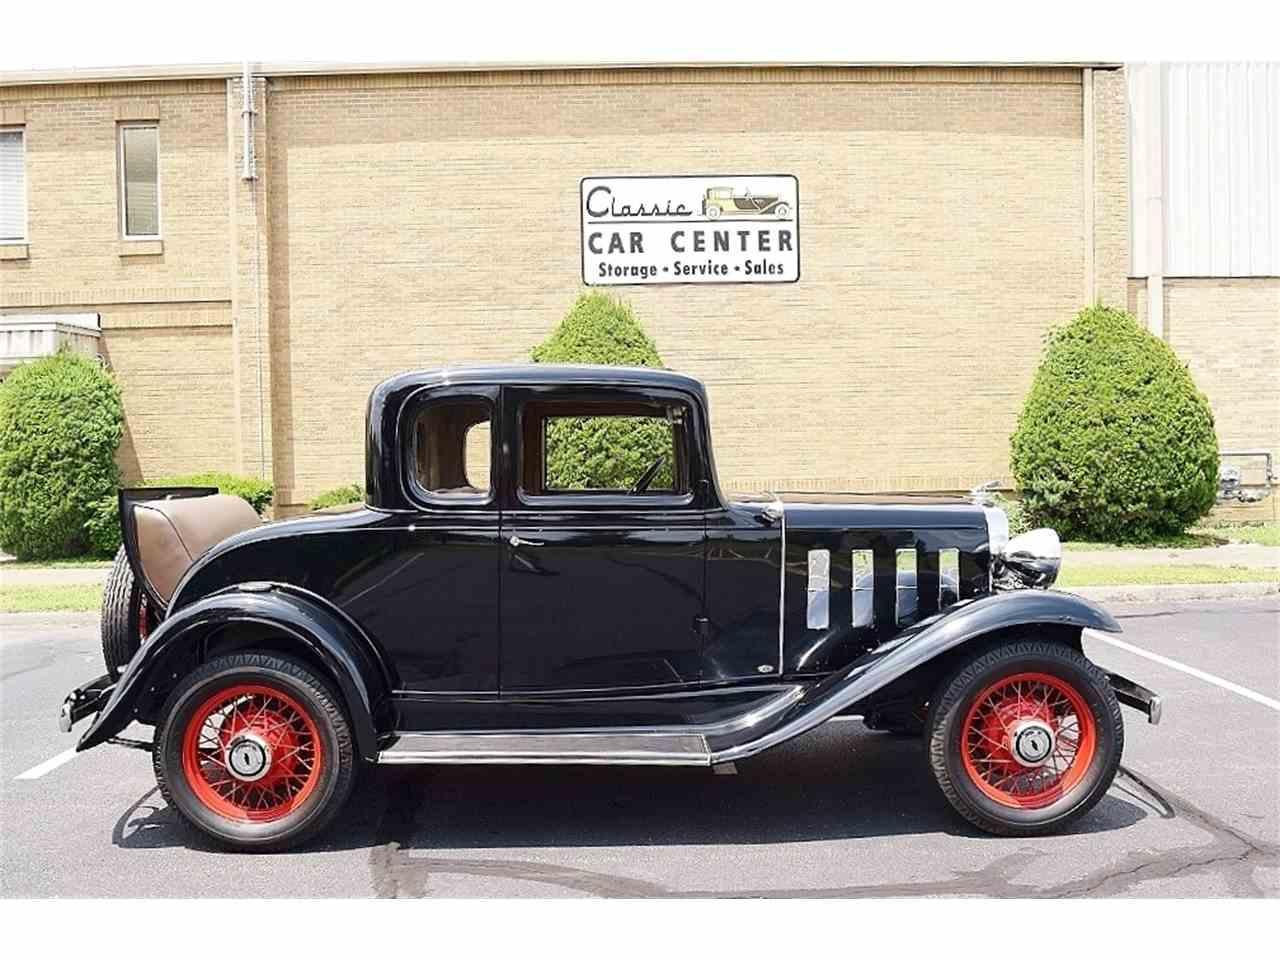 Auto For Sale Fredericksburg Va: 1932 Chevrolet BA Sports Coupe For Sale